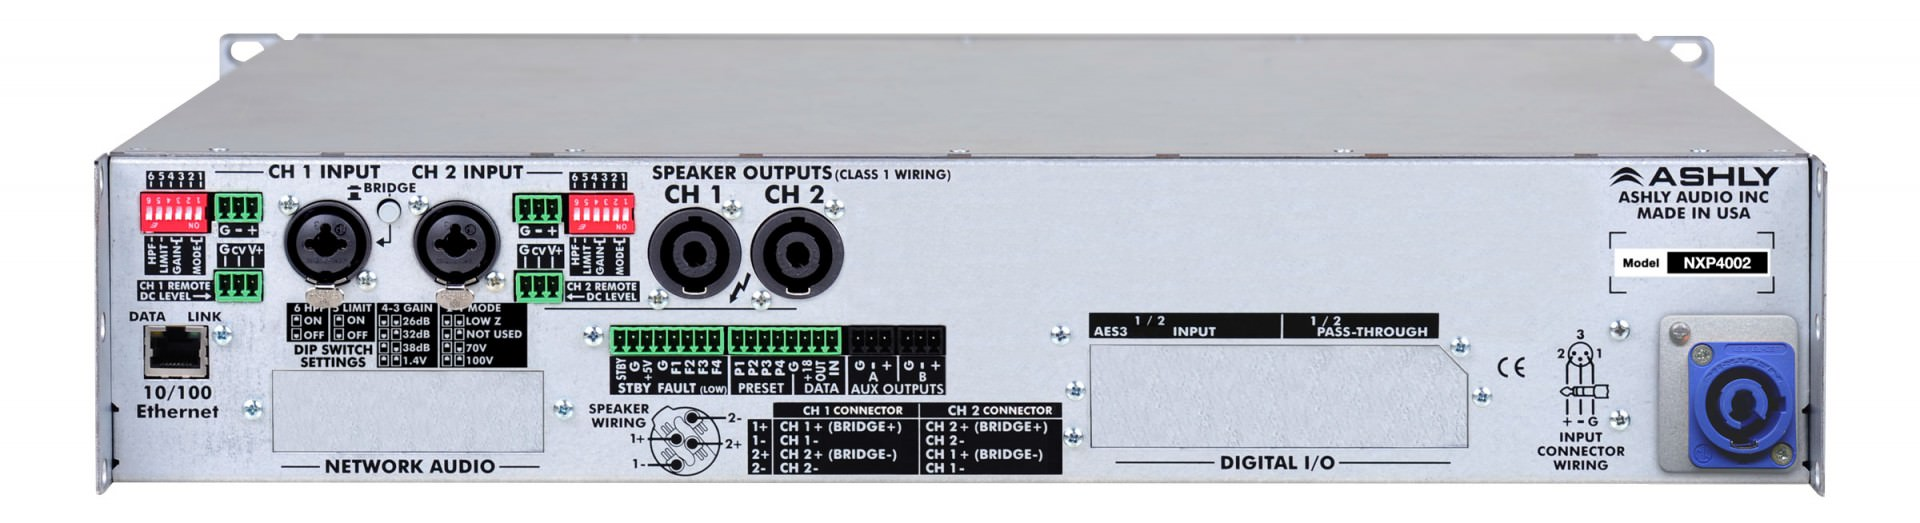 Nx Multi Mode Amplifiers Ashly Audio 400w Amplifier Schema And Layout Rear